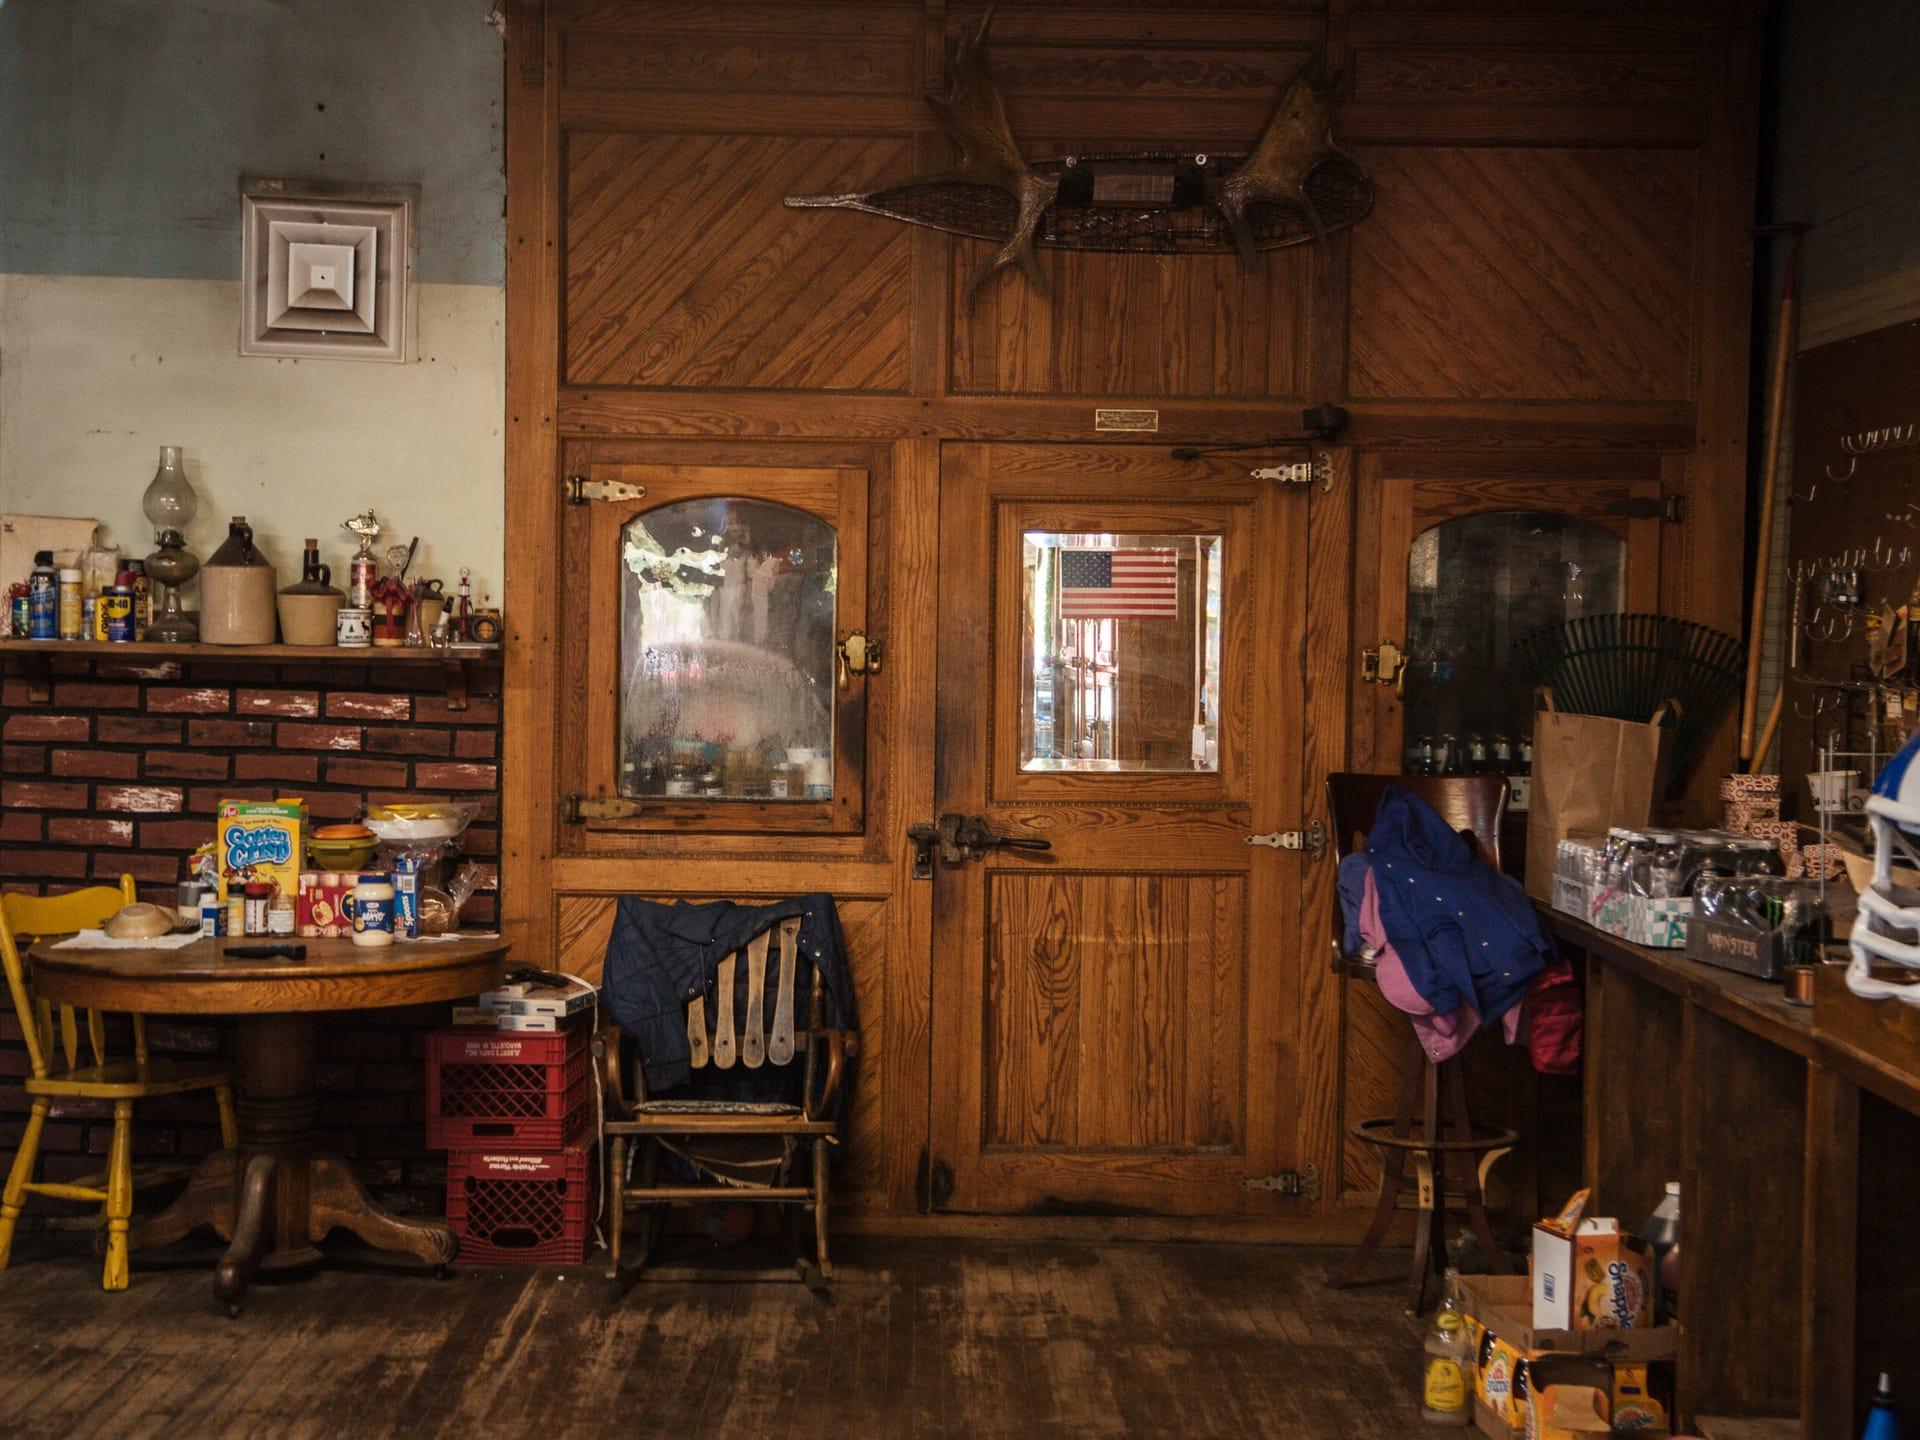 An antique, walk-in cooler inside the Phoenix Store